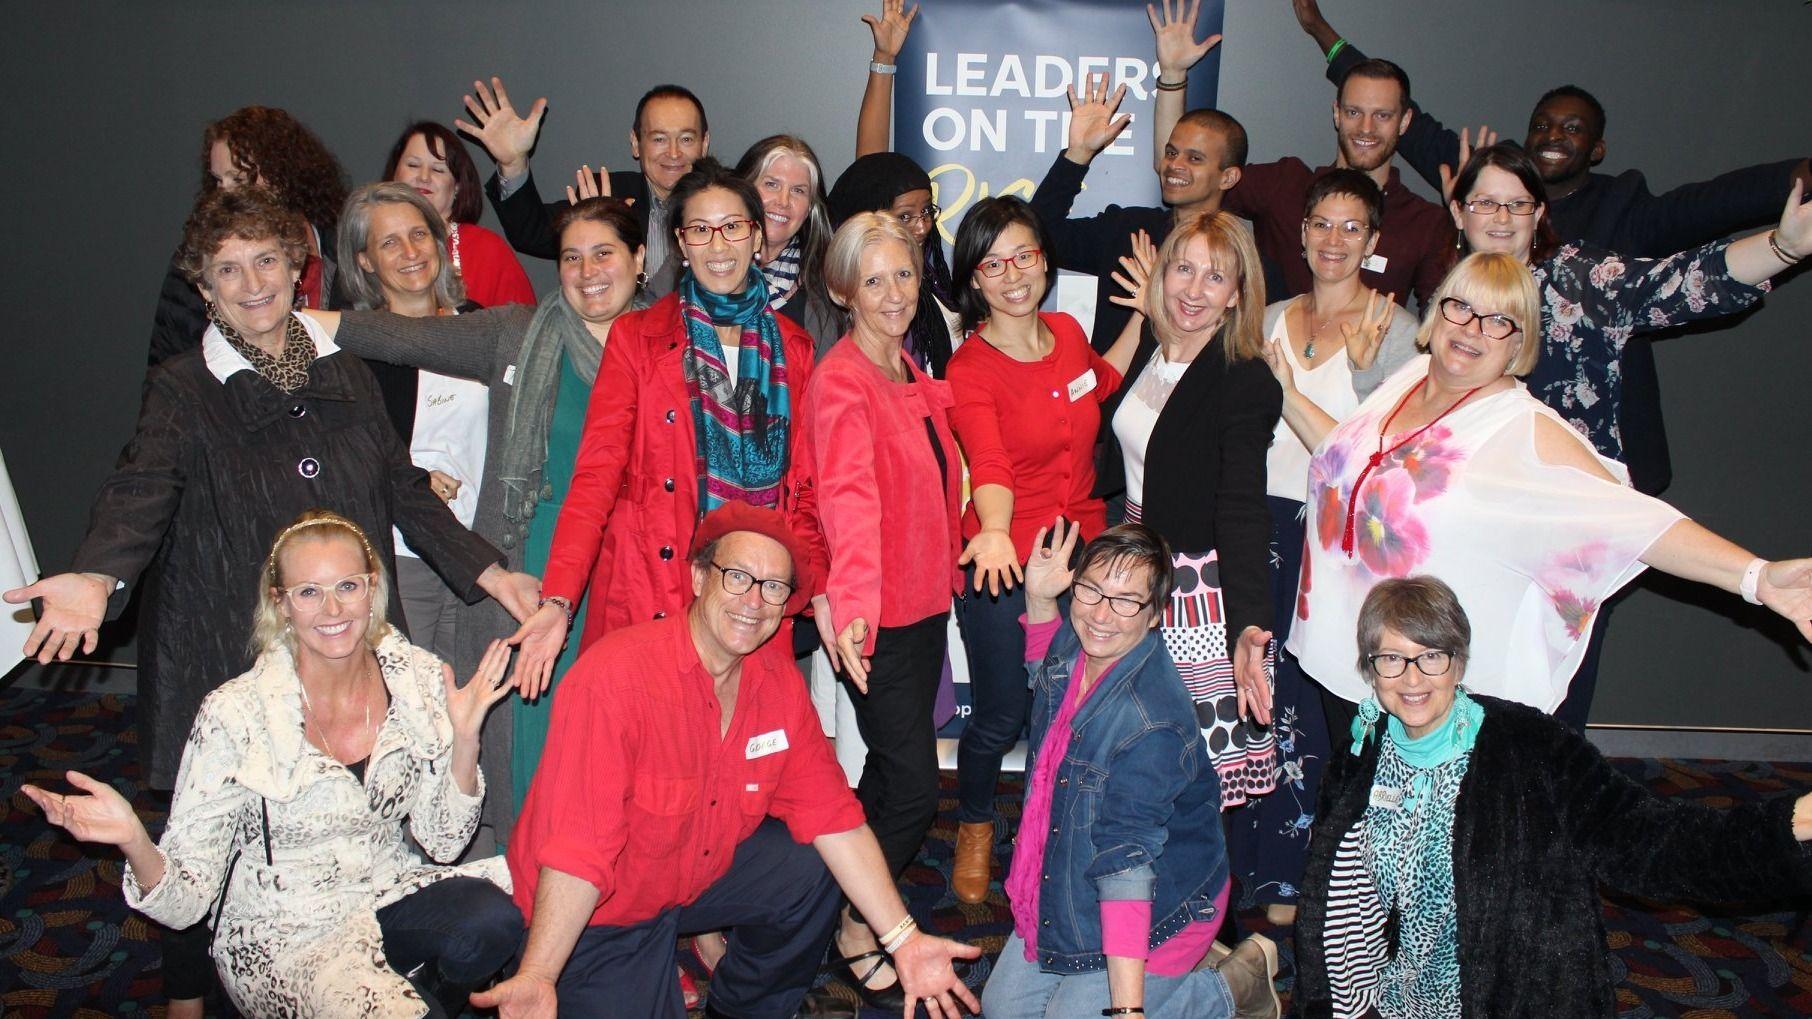 Leaders on the Rise - Brisbane.